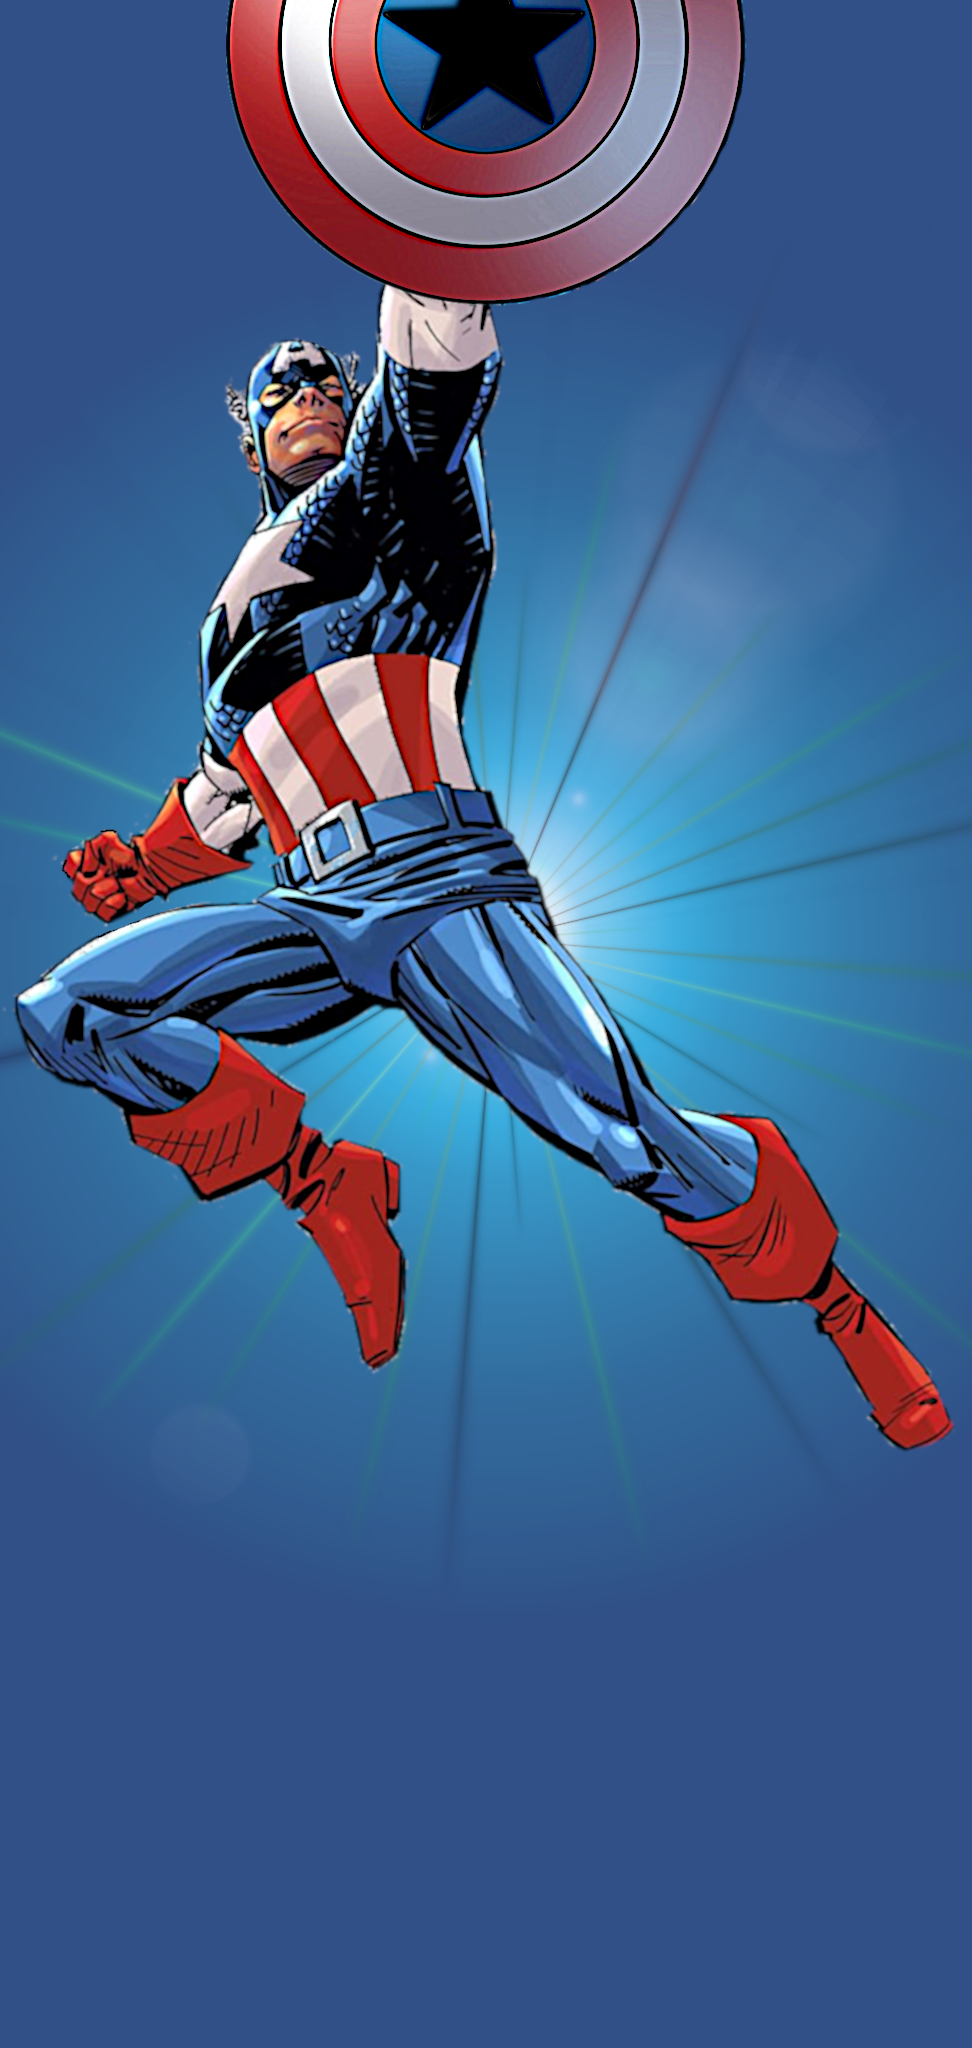 Kapitan Amerika - Note 10 Plus HD Divar kağızları